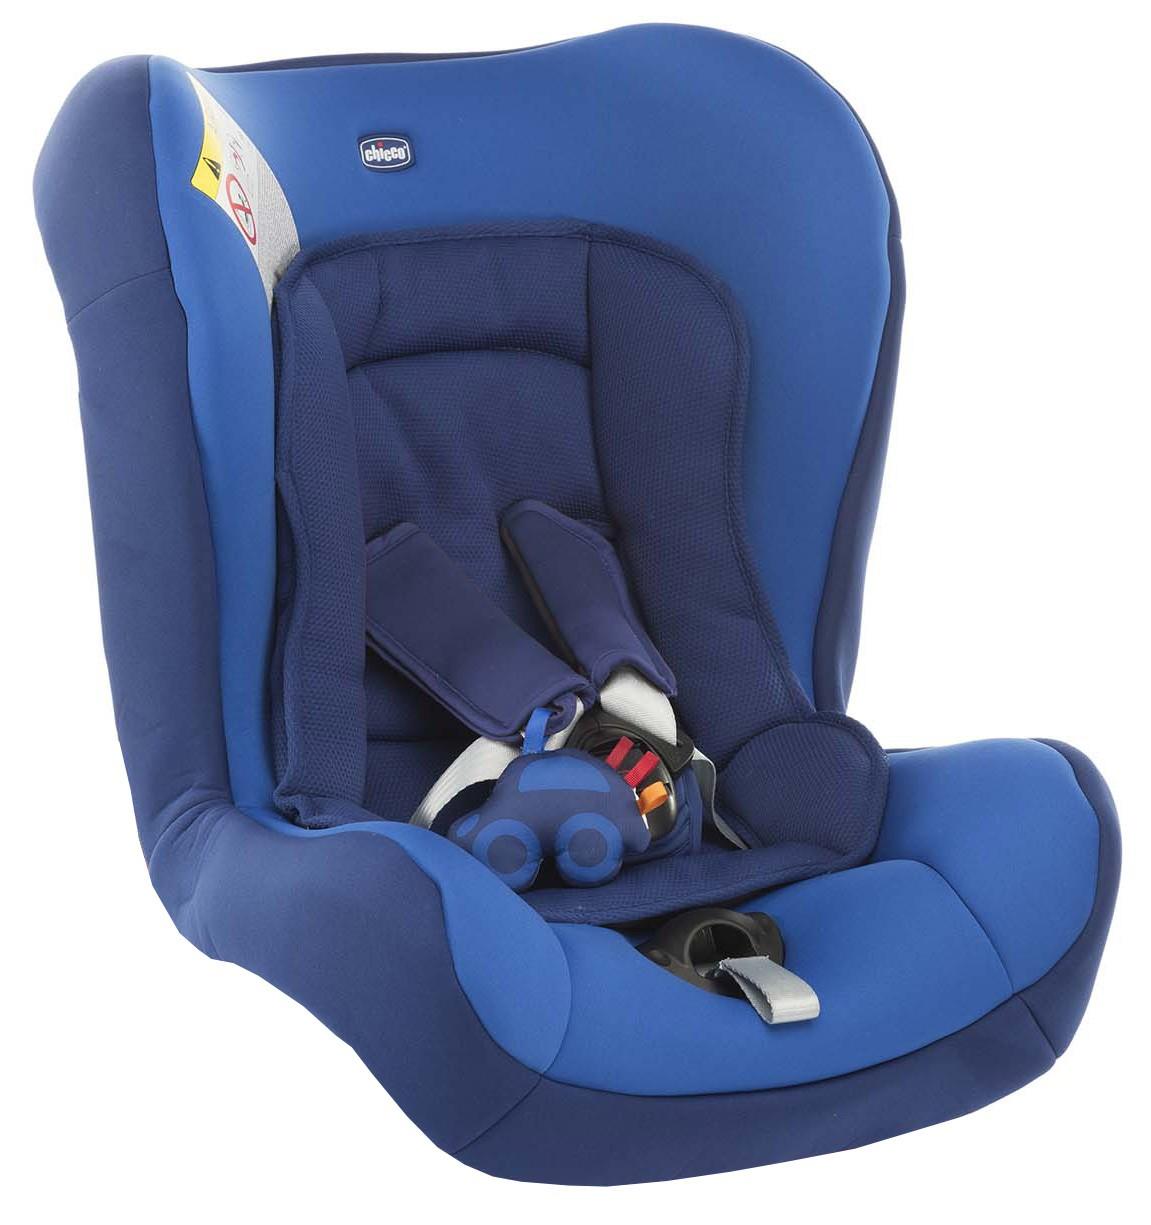 Chicco Bezug für Kindersitz Cosmos Blue